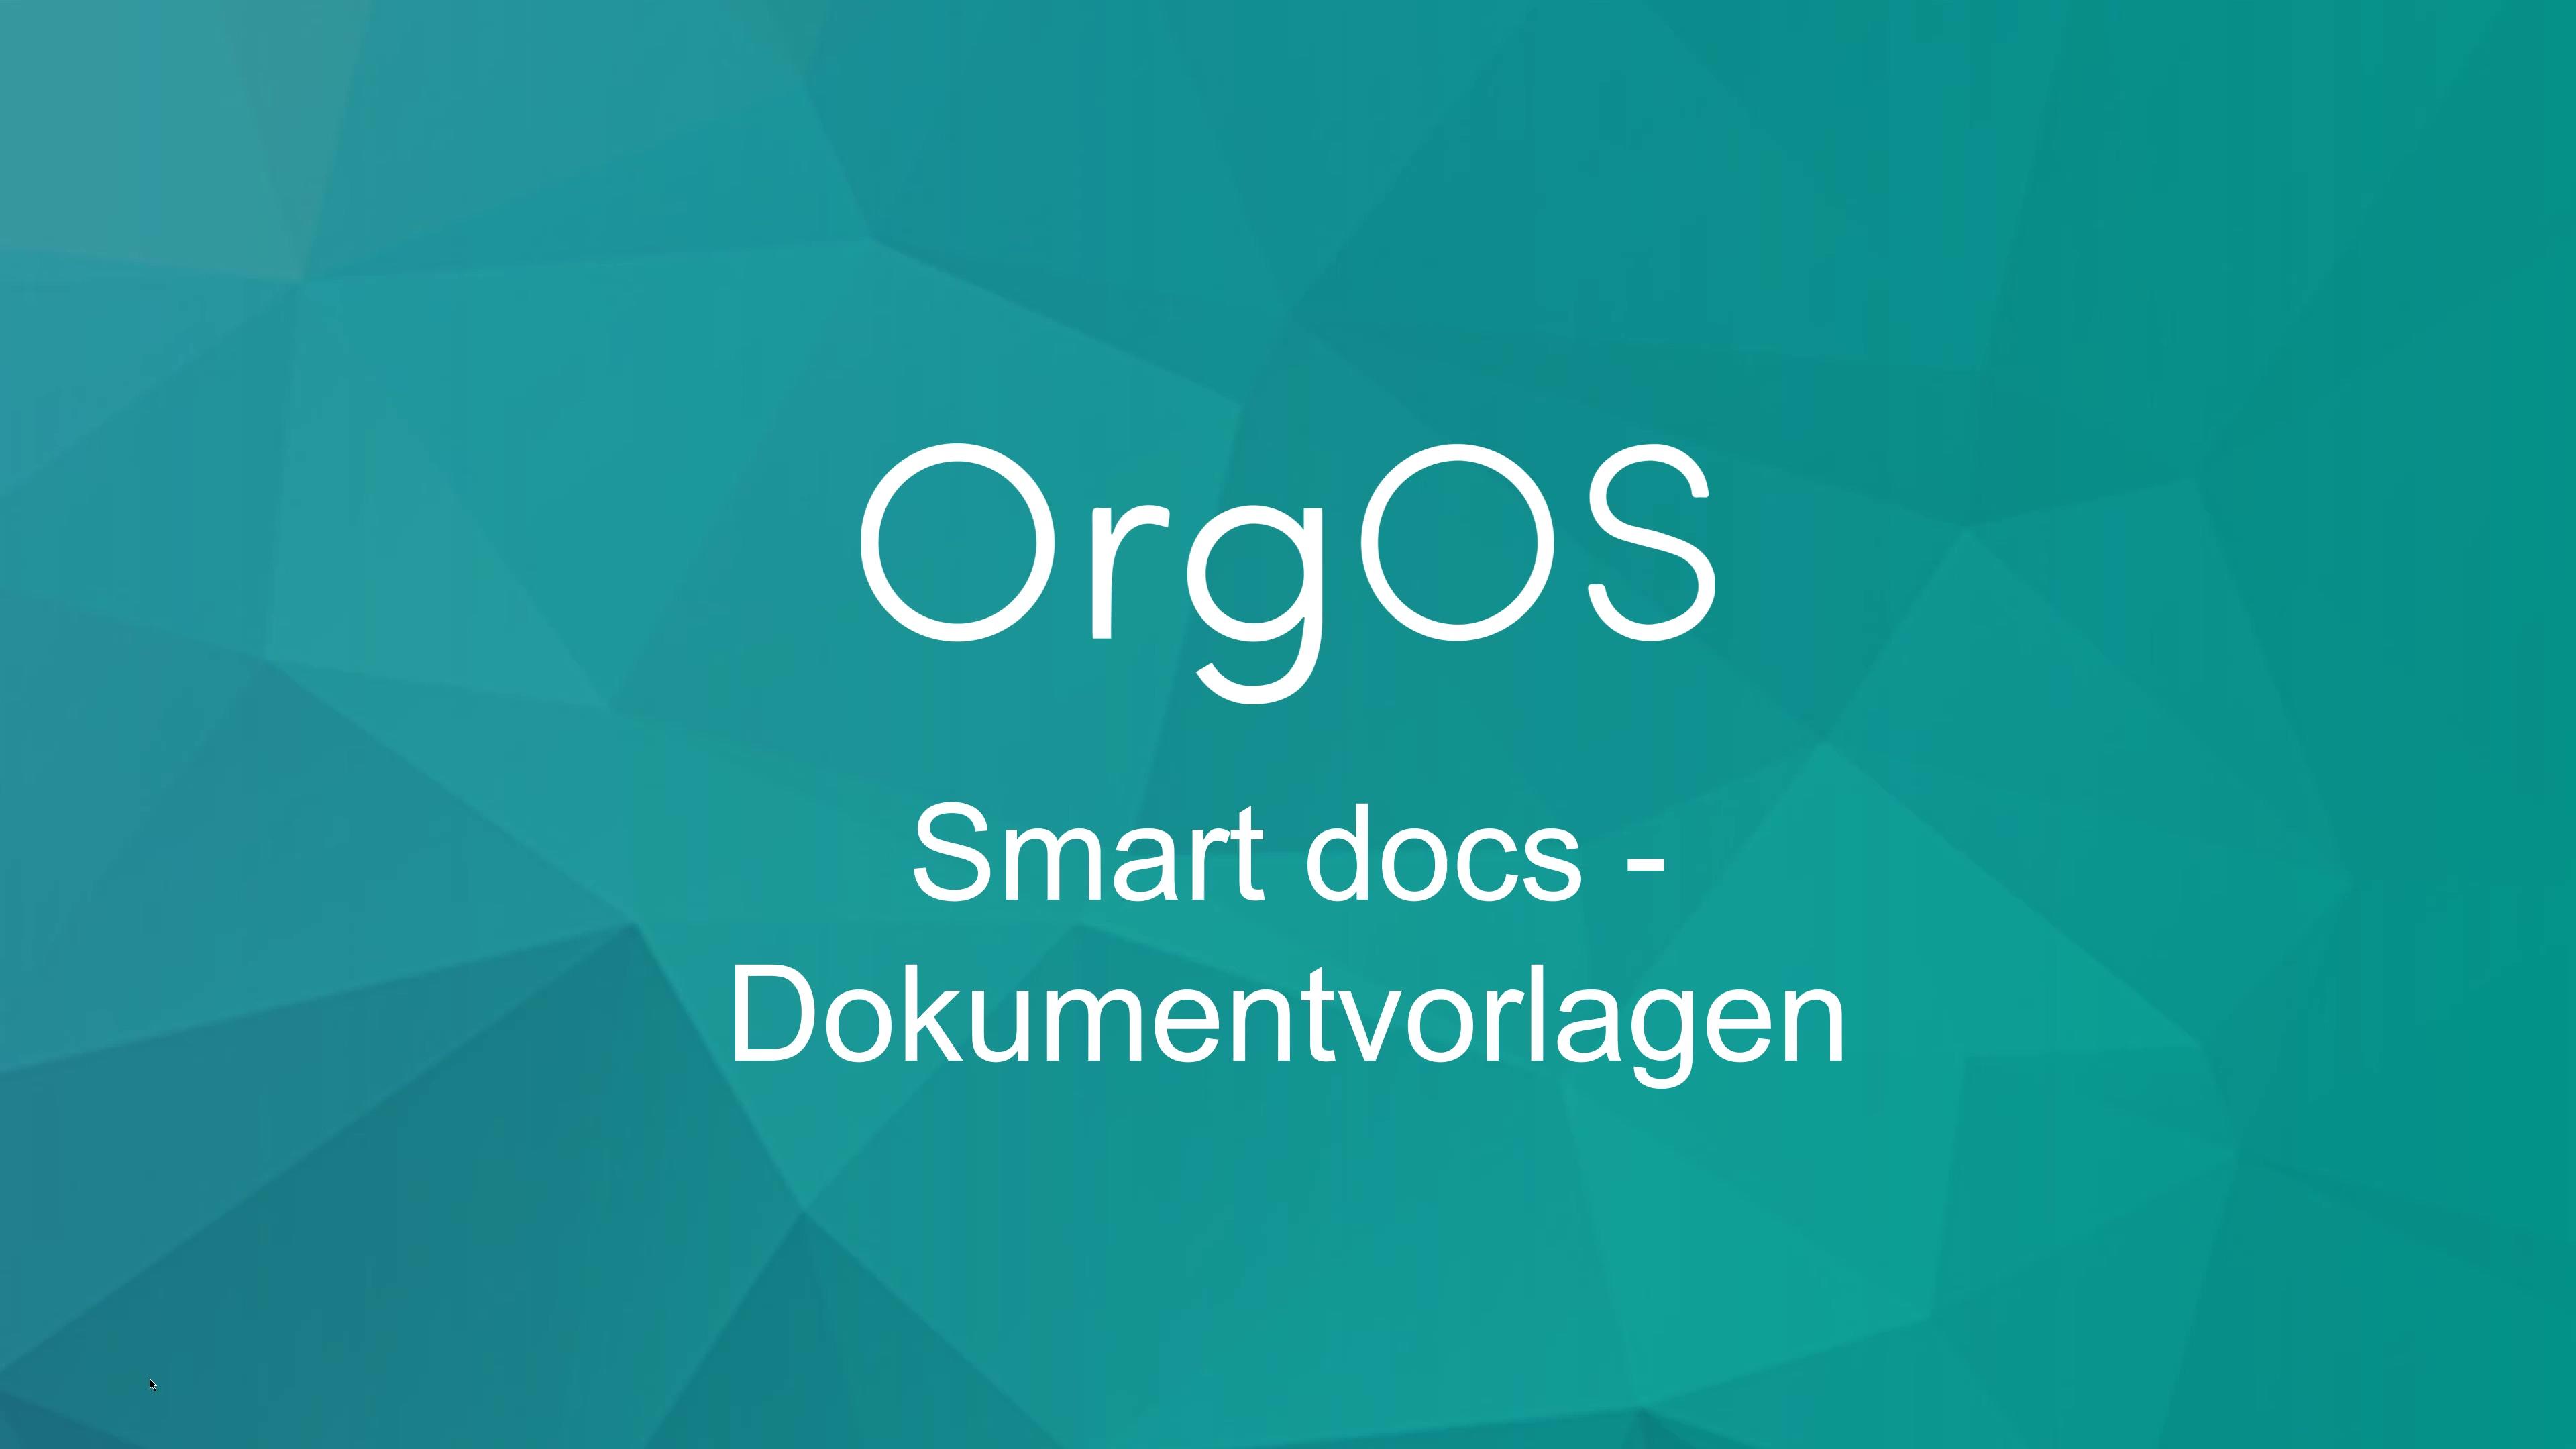 Smart docs - Dokumentvorlagen